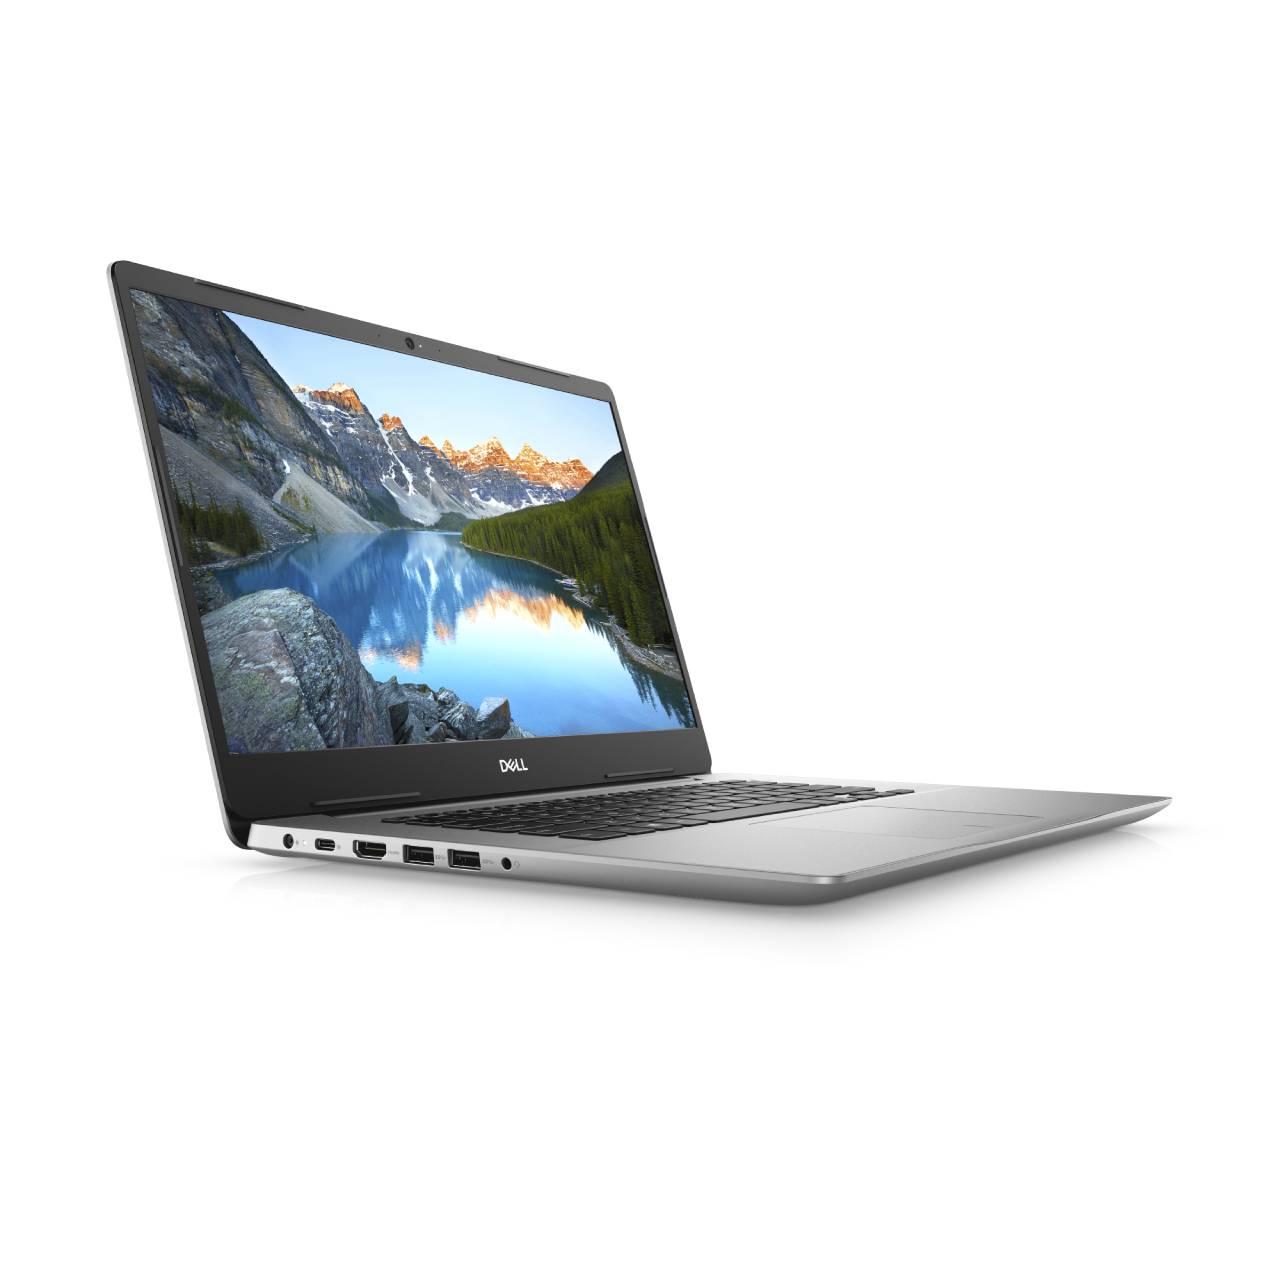 Dell Inspiron 15 5585 Laptop 15 6